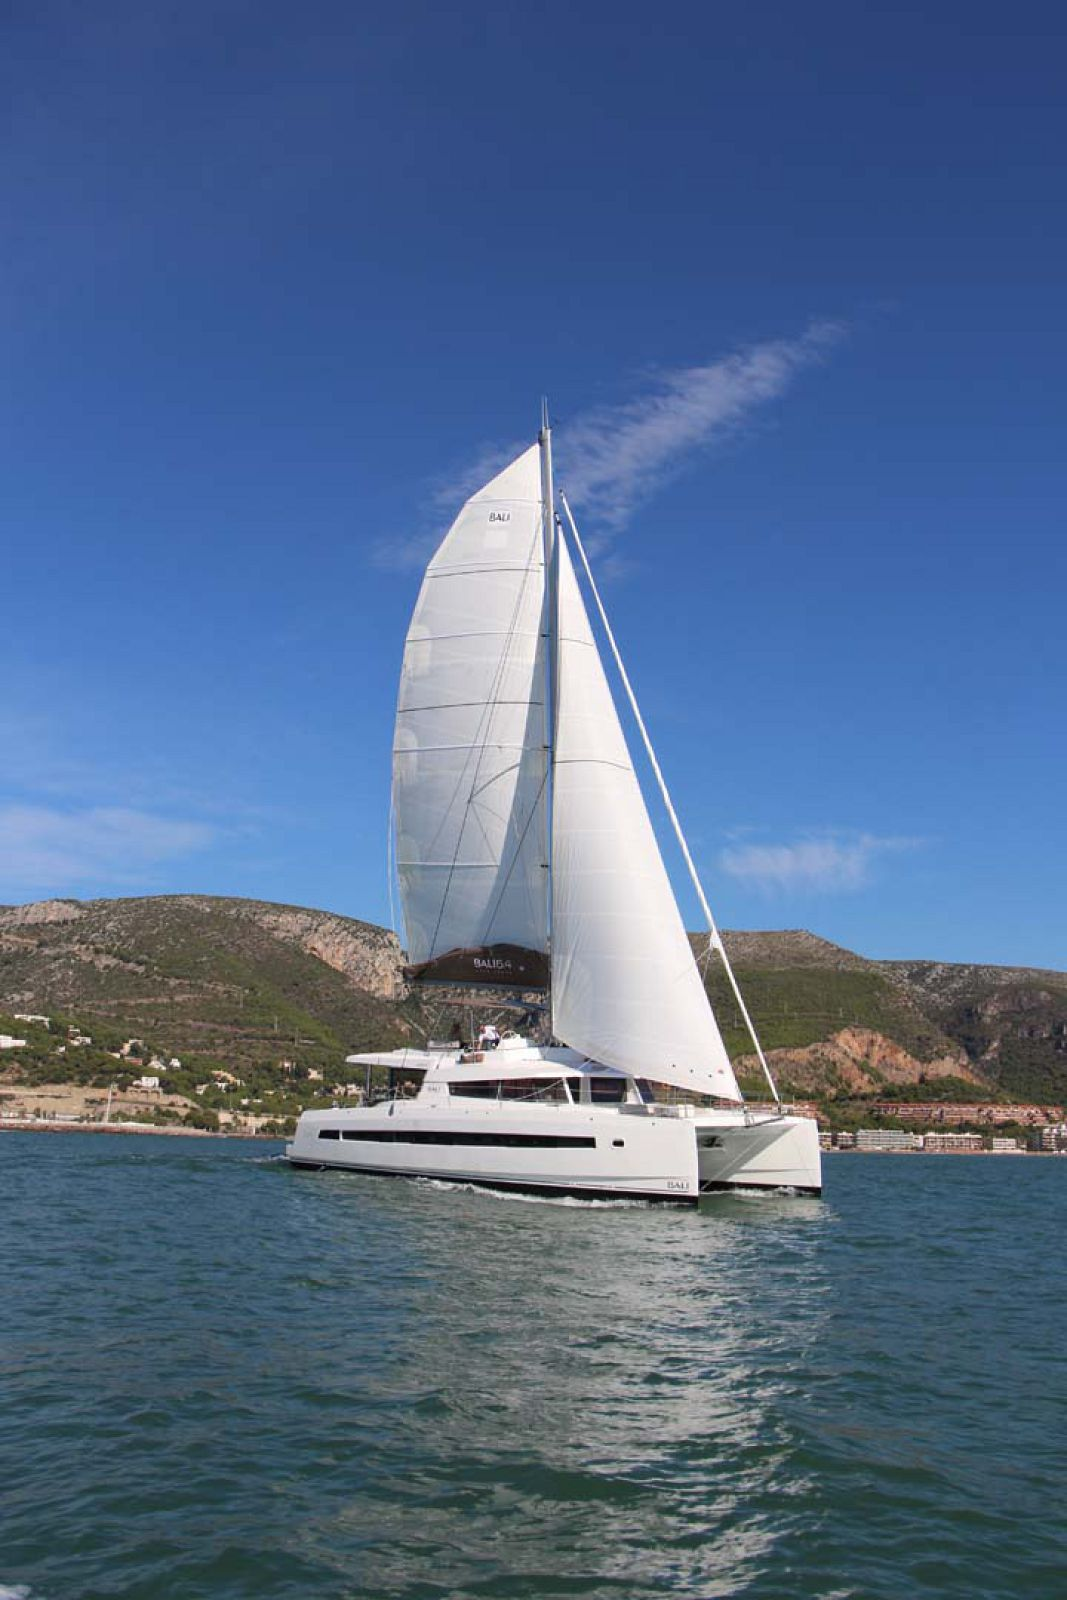 Bali 5.4 sailing cat mast